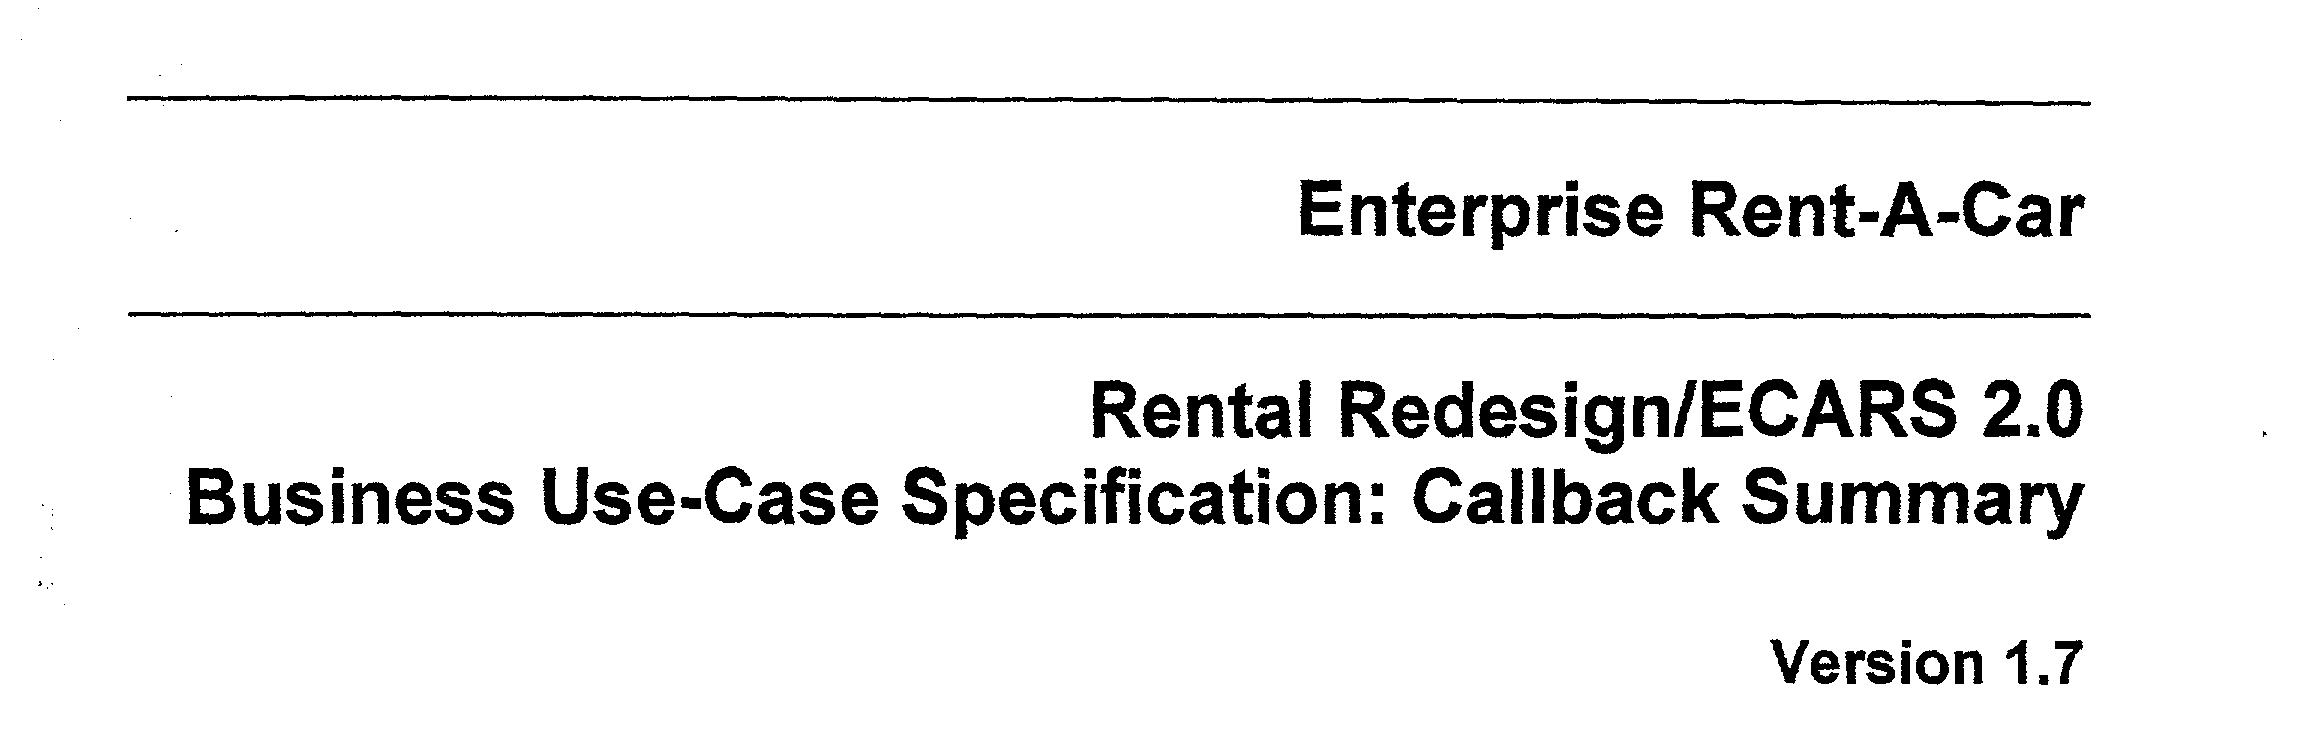 Figure US20030125992A1-20030703-P01402